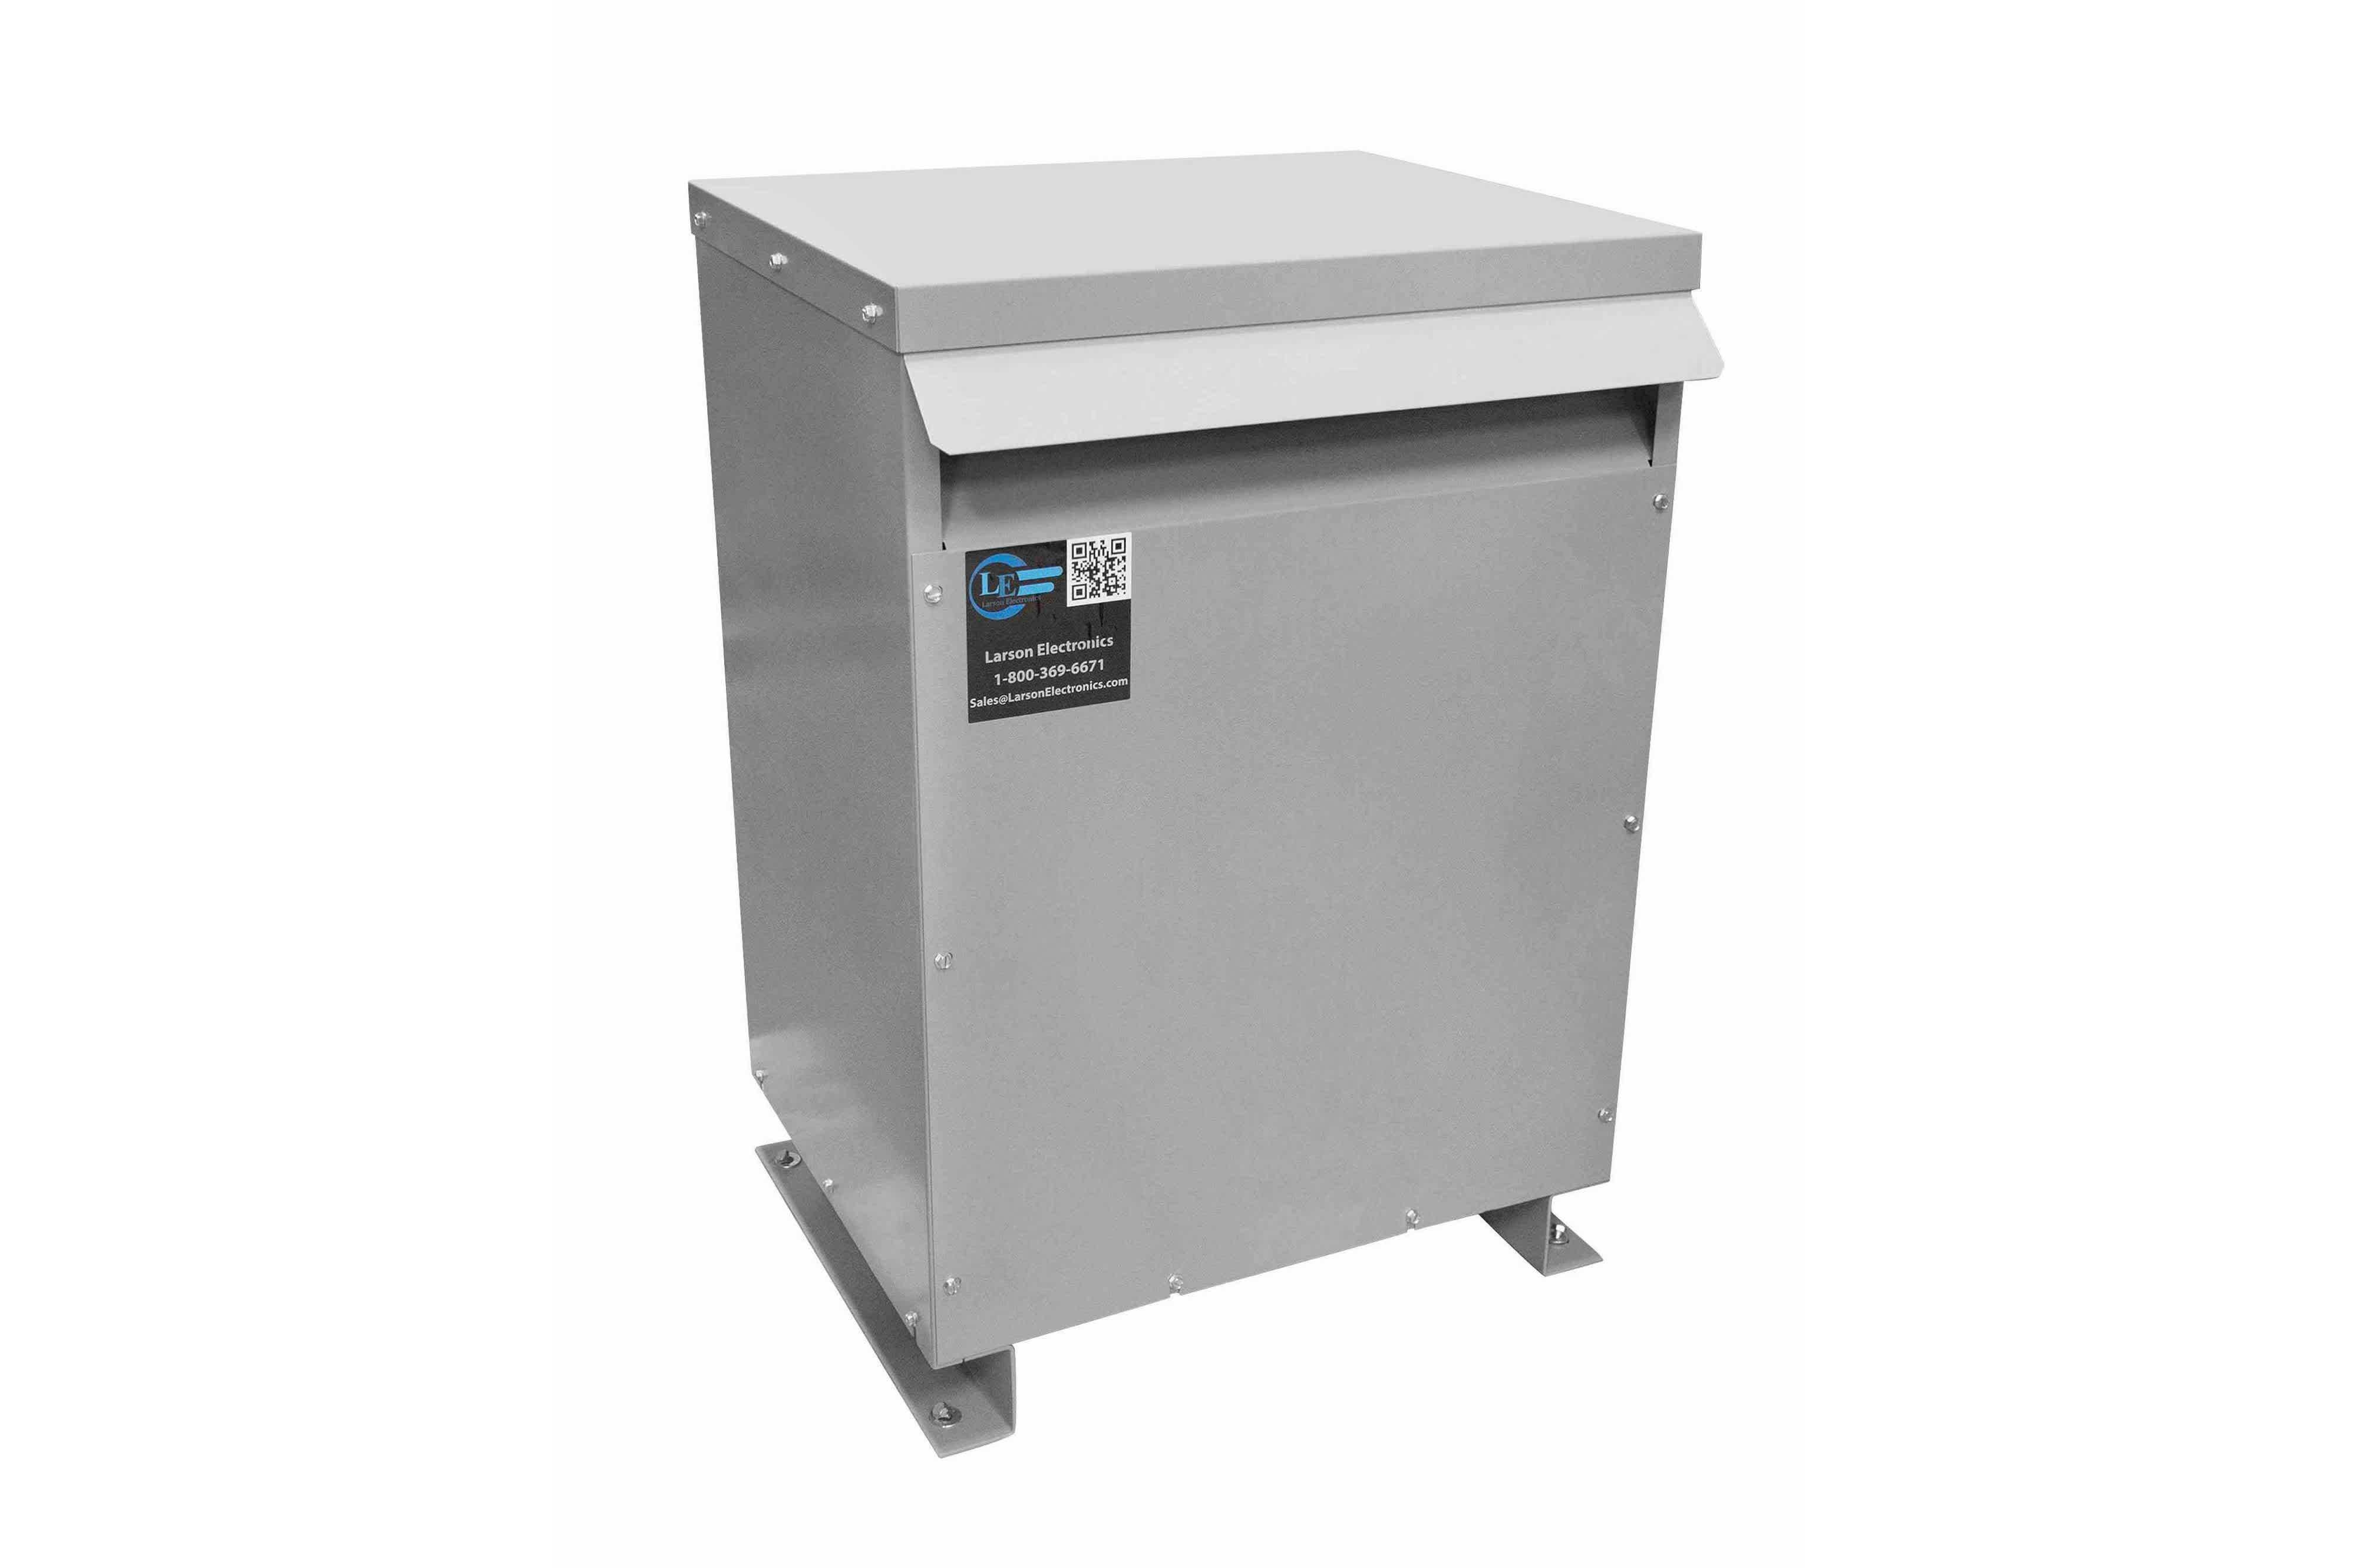 275 kVA 3PH Isolation Transformer, 480V Wye Primary, 575Y/332 Wye-N Secondary, N3R, Ventilated, 60 Hz